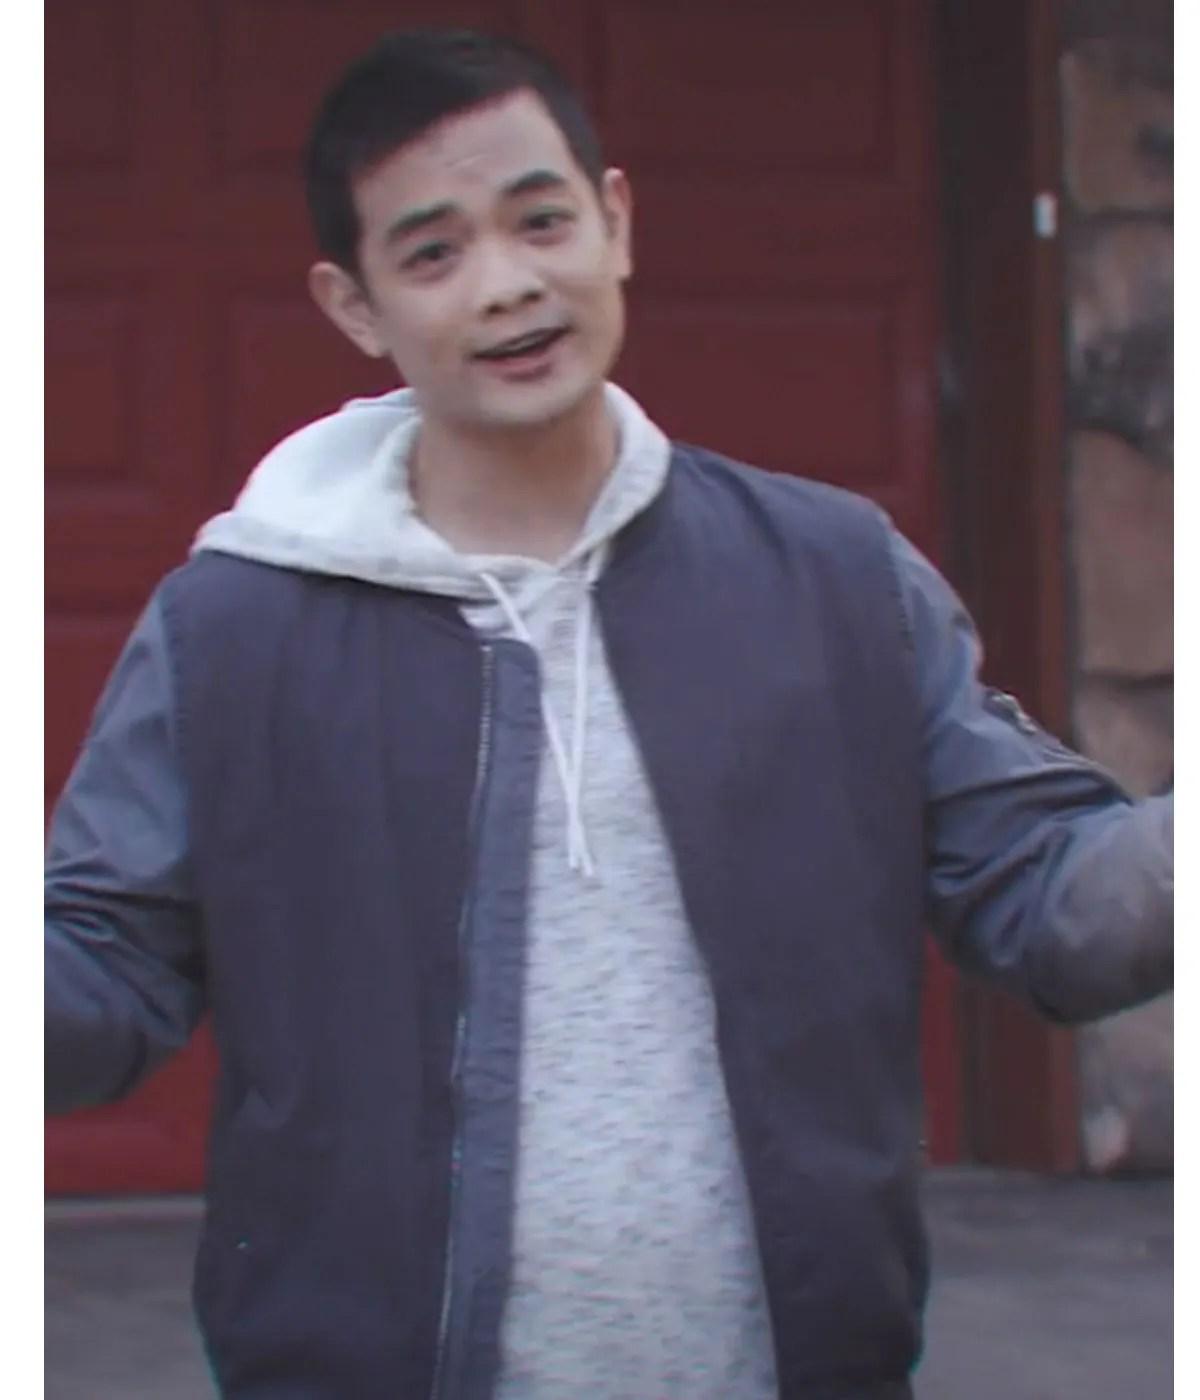 osric-chau-superhost-jacket